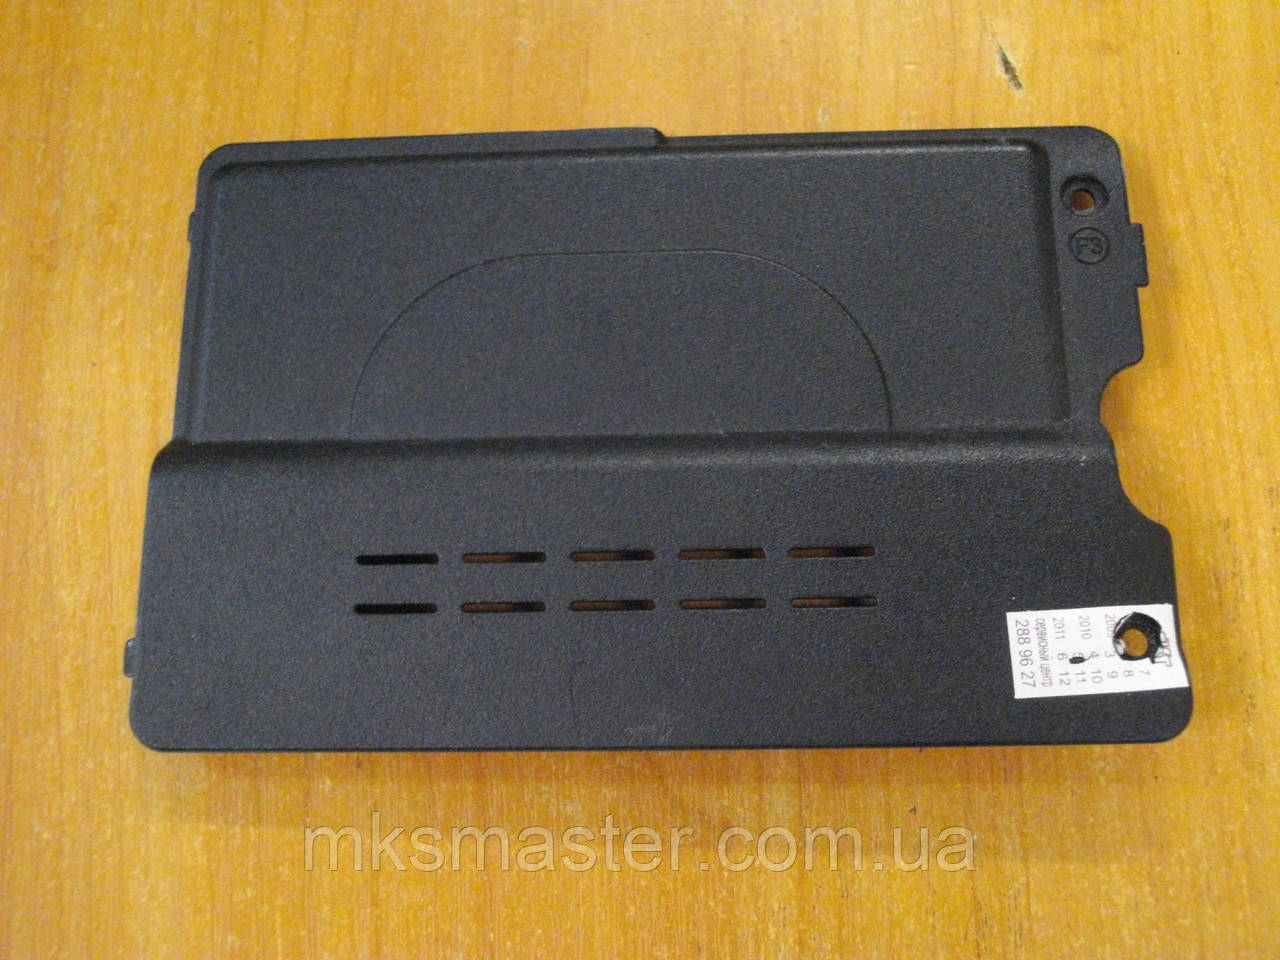 Сервисная Крышка Люк Корпус от ноутбука Toshiba Satellite A135 A135-S226 бу